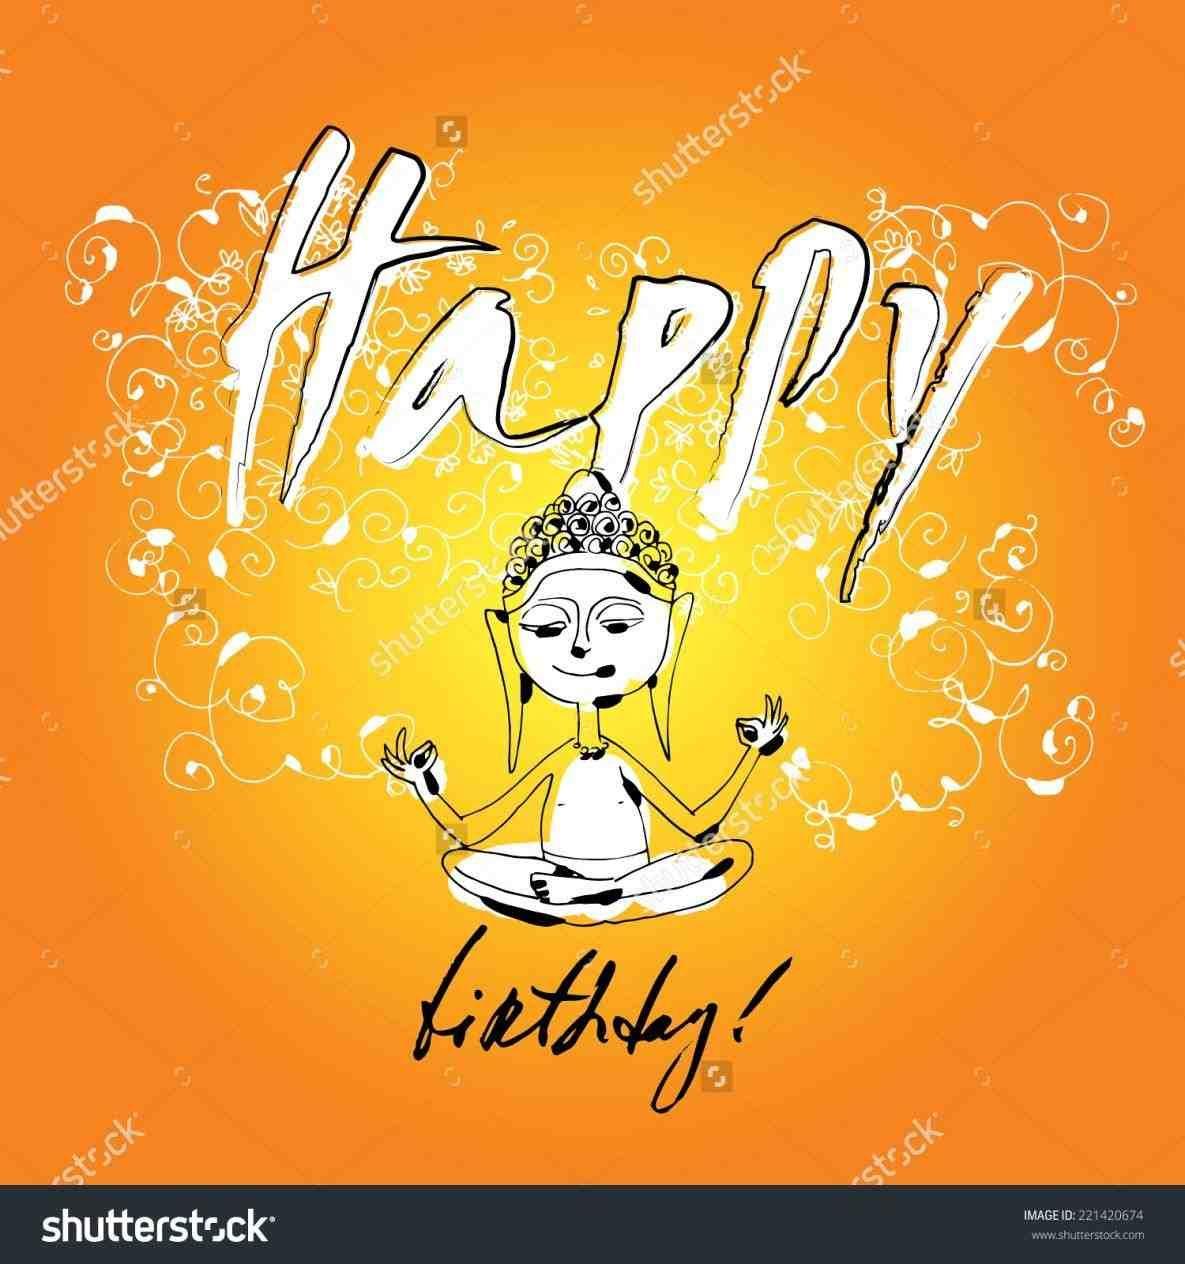 Happy Birthday Funny. Birthday Greetings Friend. Funny